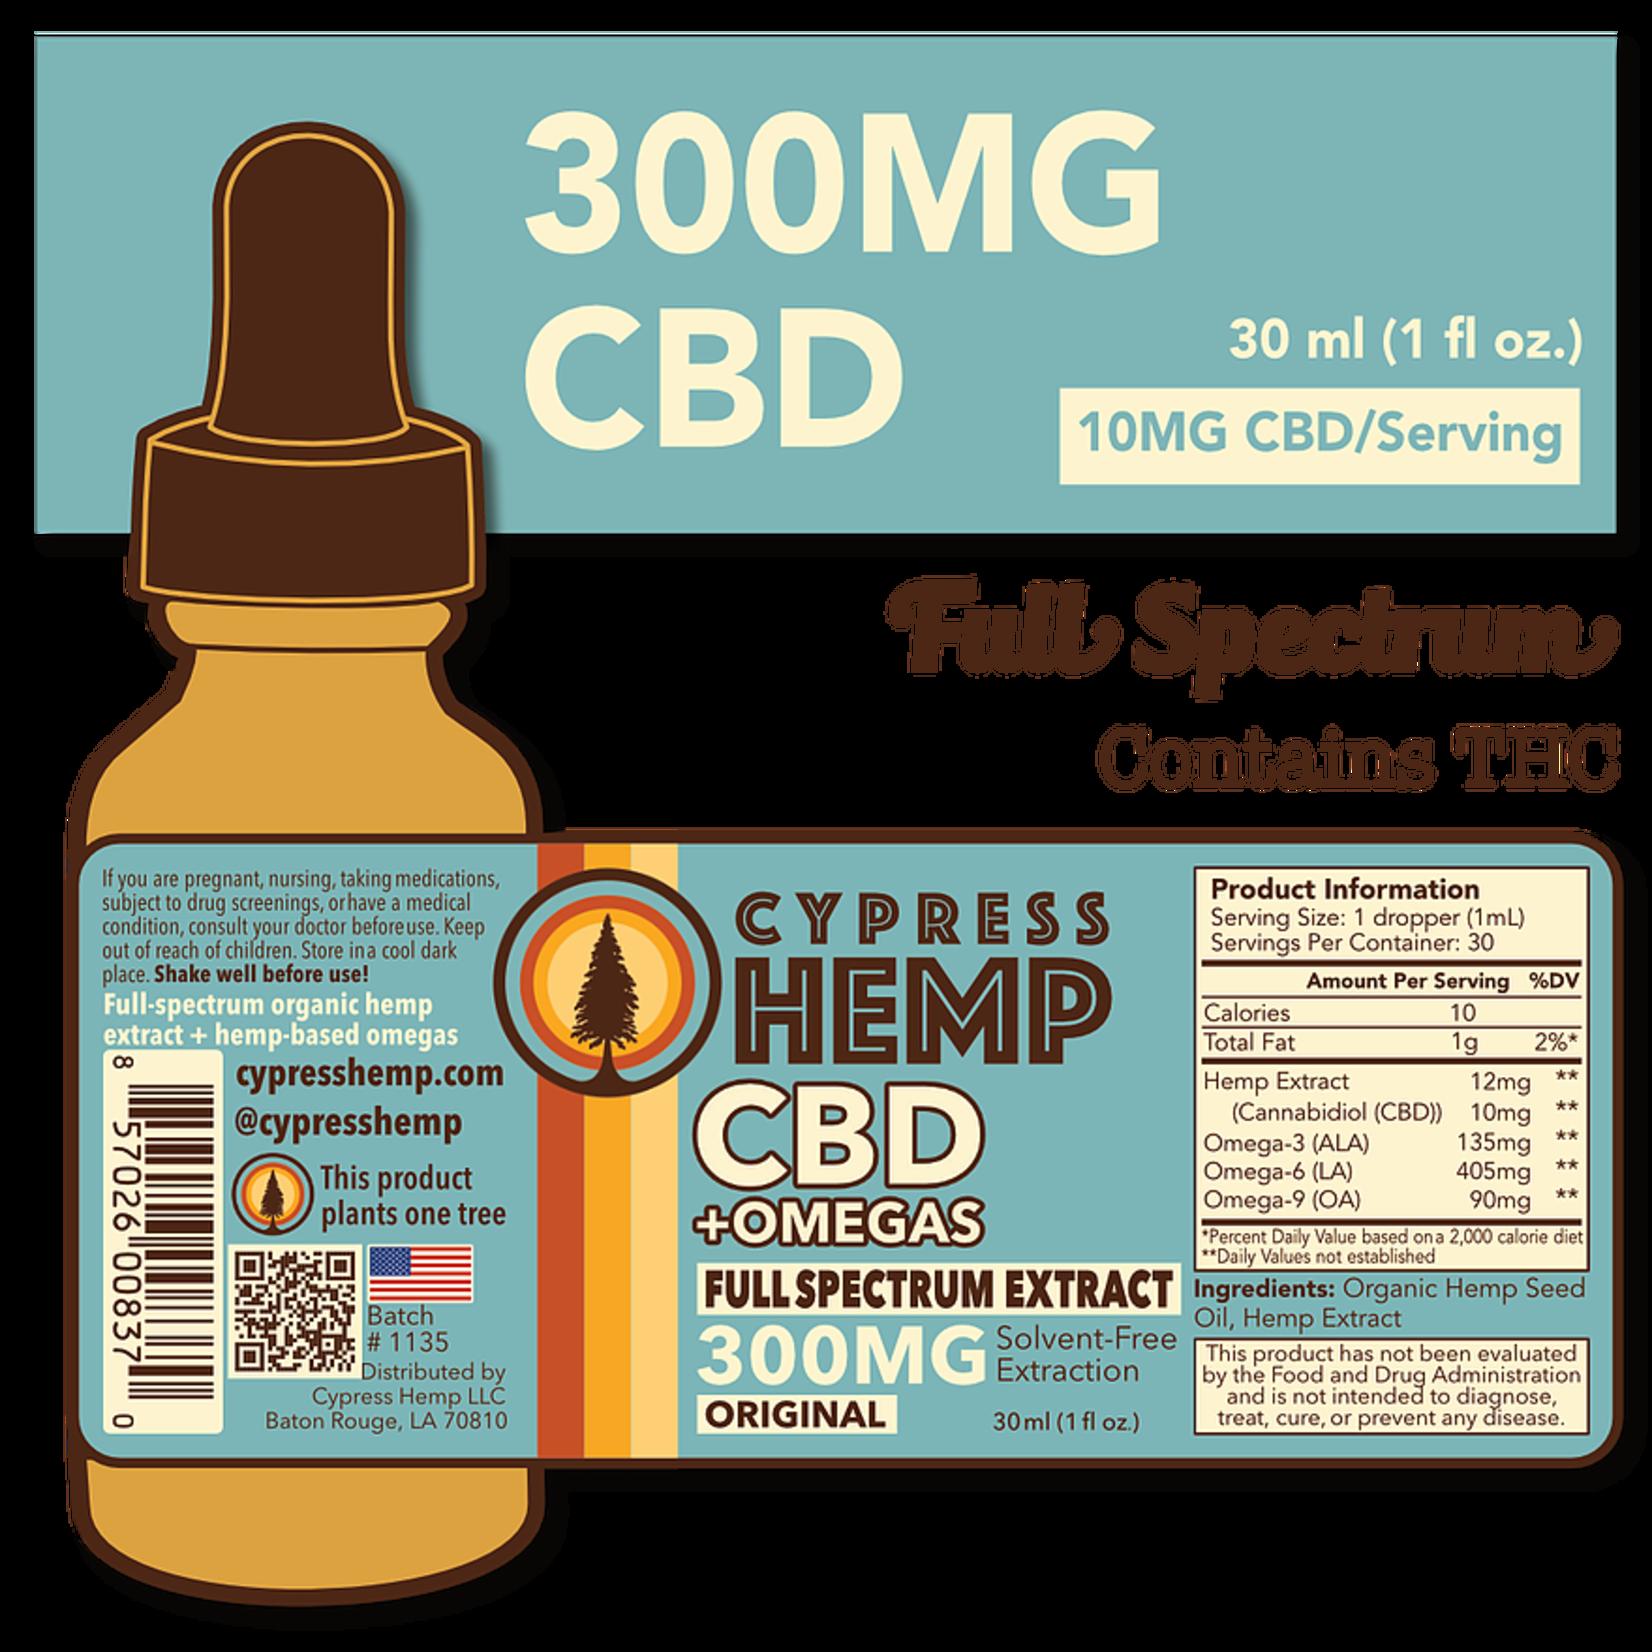 Cypress Hemp CBD + Omegas Full Spectrum 300mg